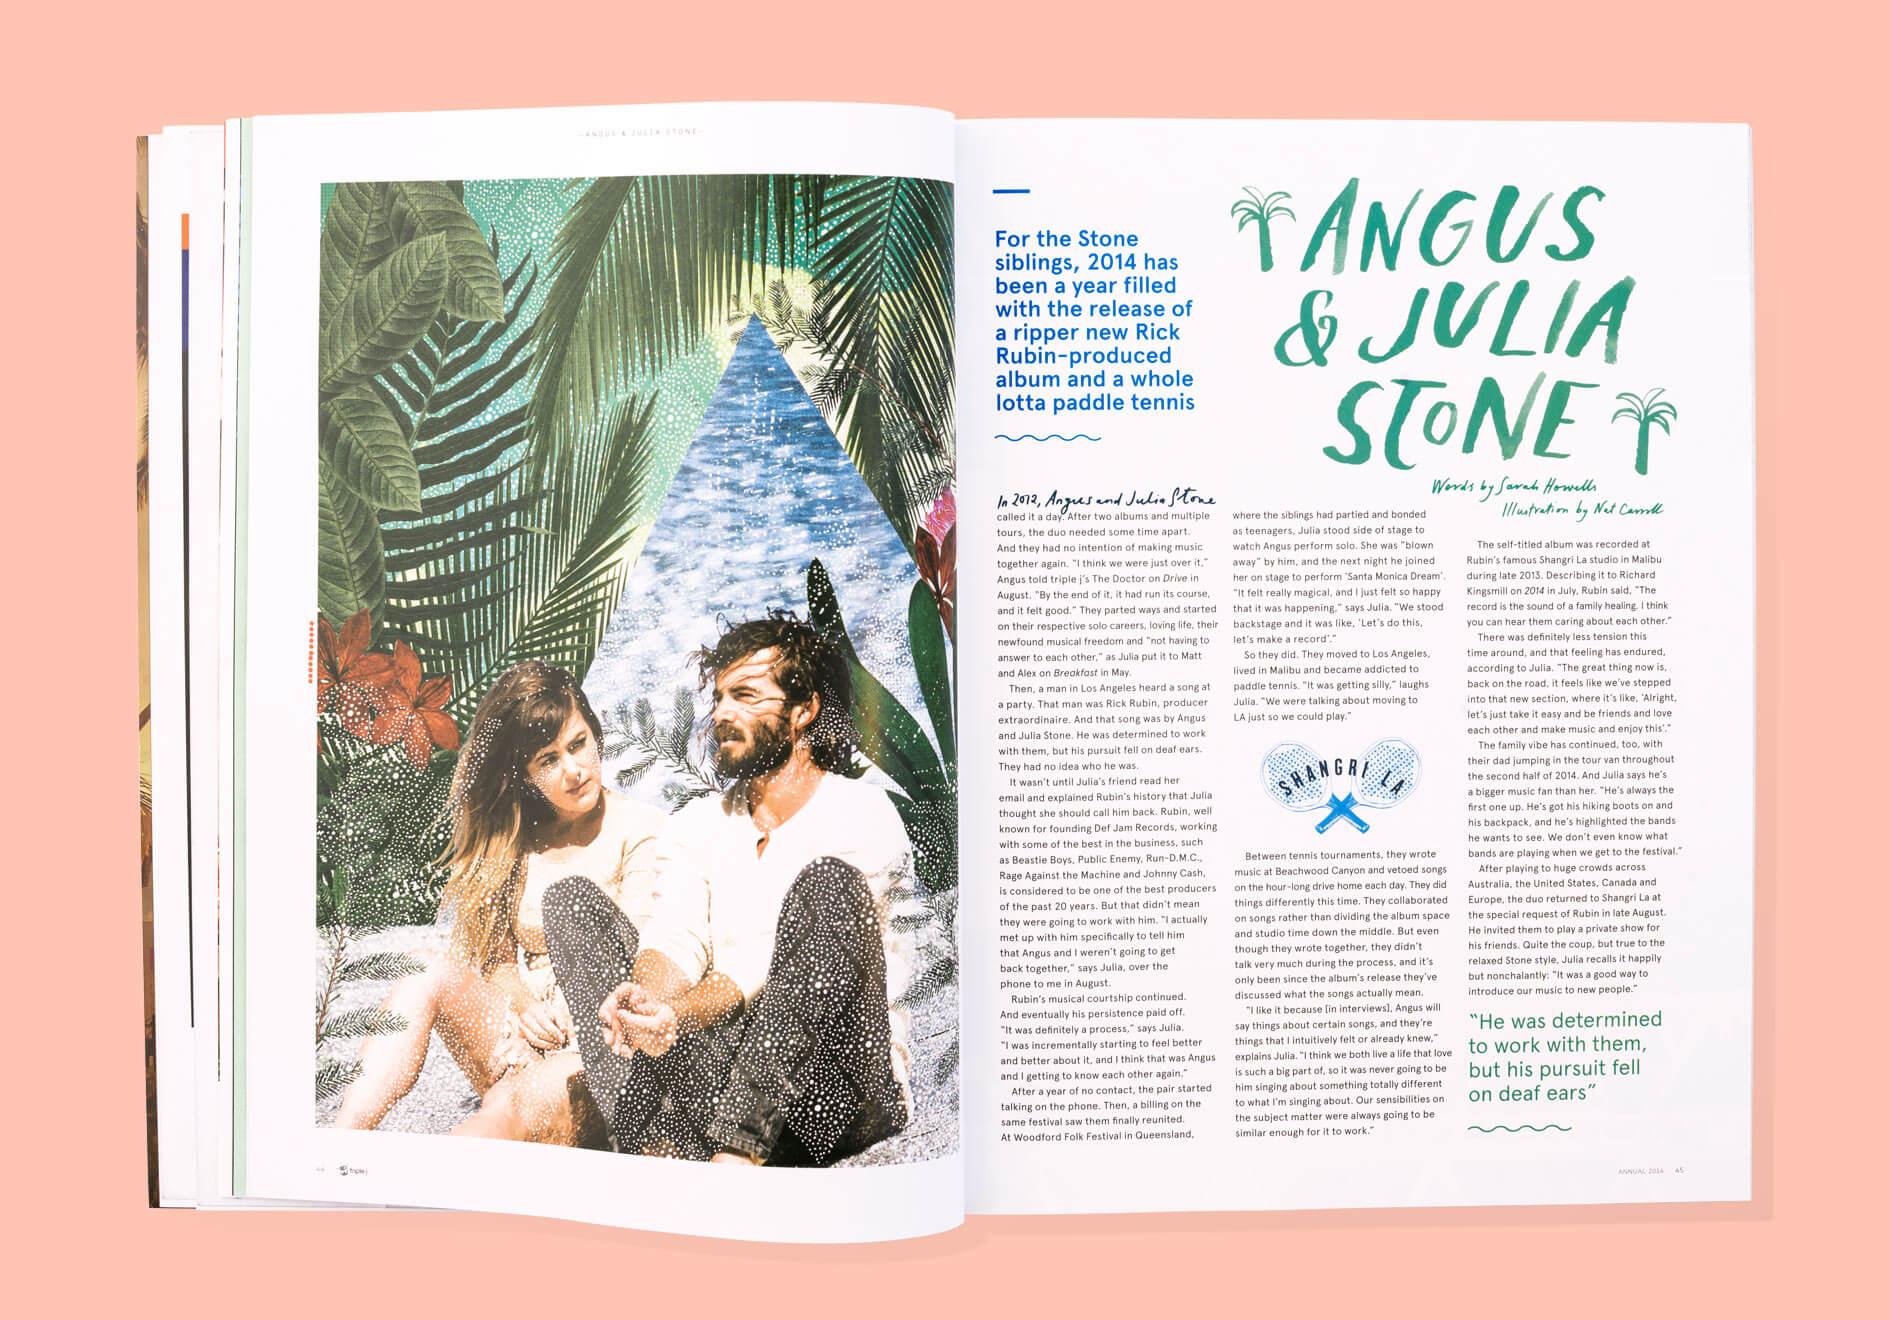 NatCarroll_triplej_Annual_2014_Magazine_AngusJuliaStone_Spread_10col